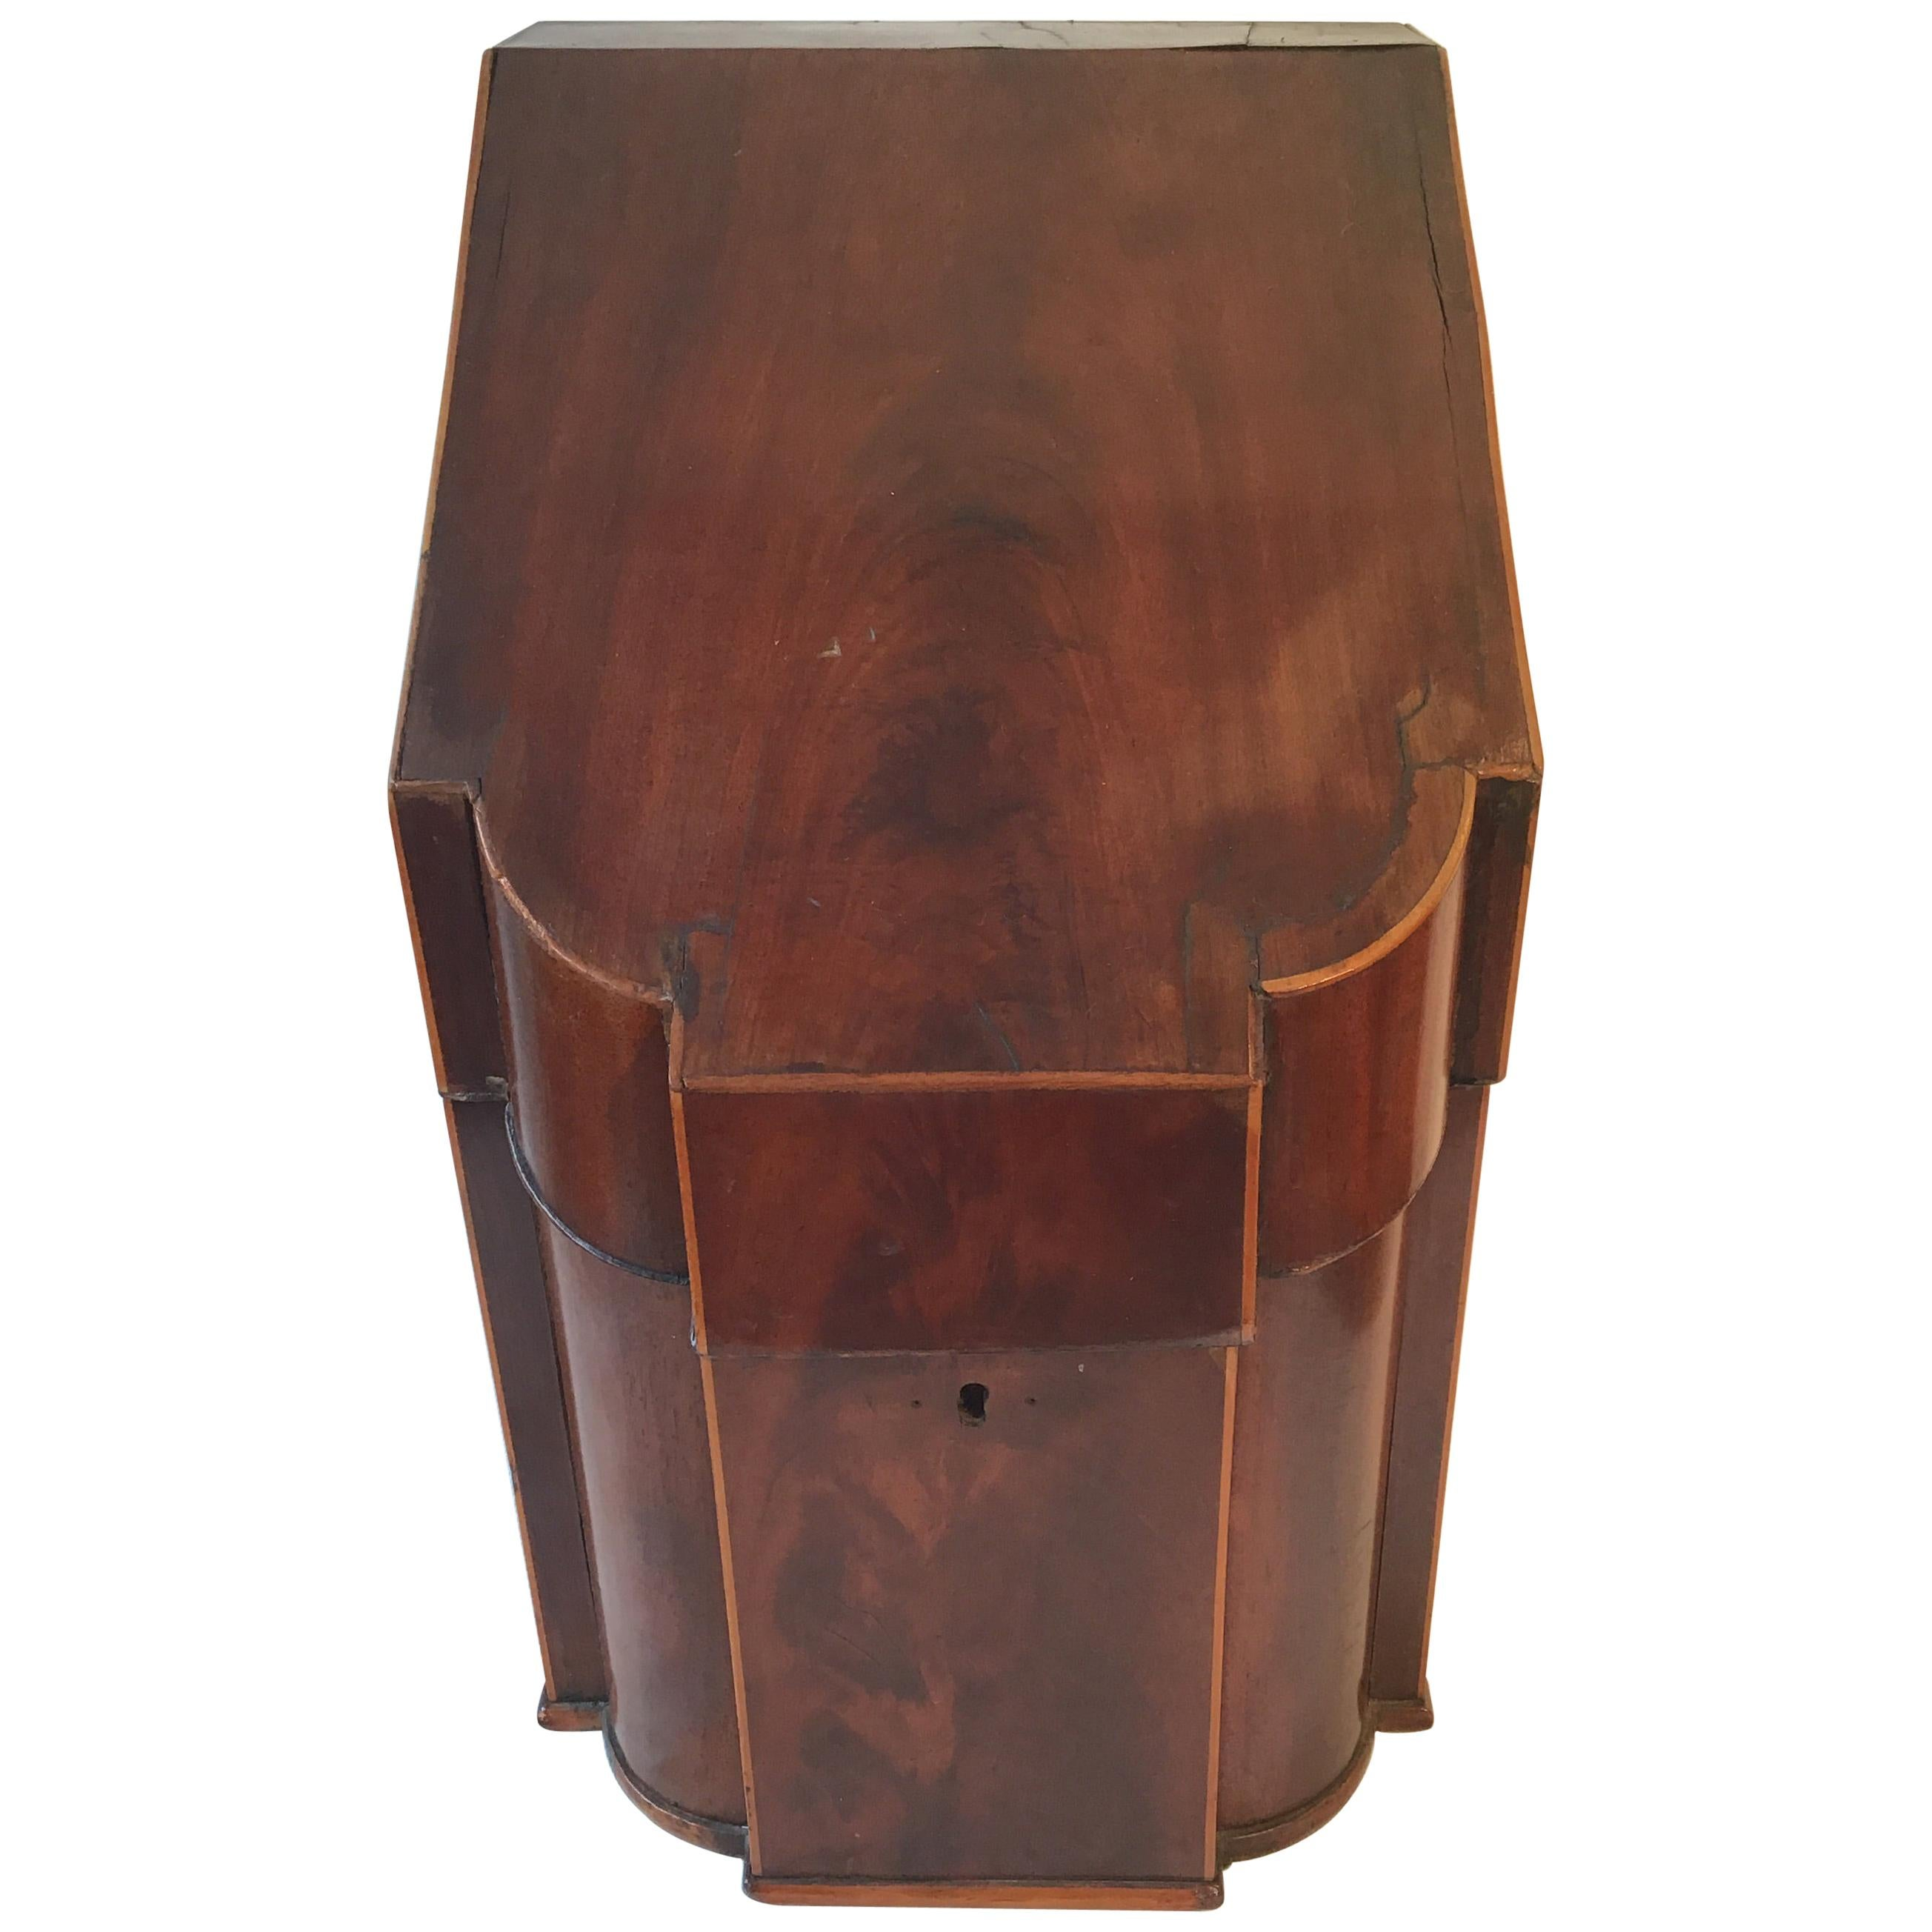 1880s English Stationary Box